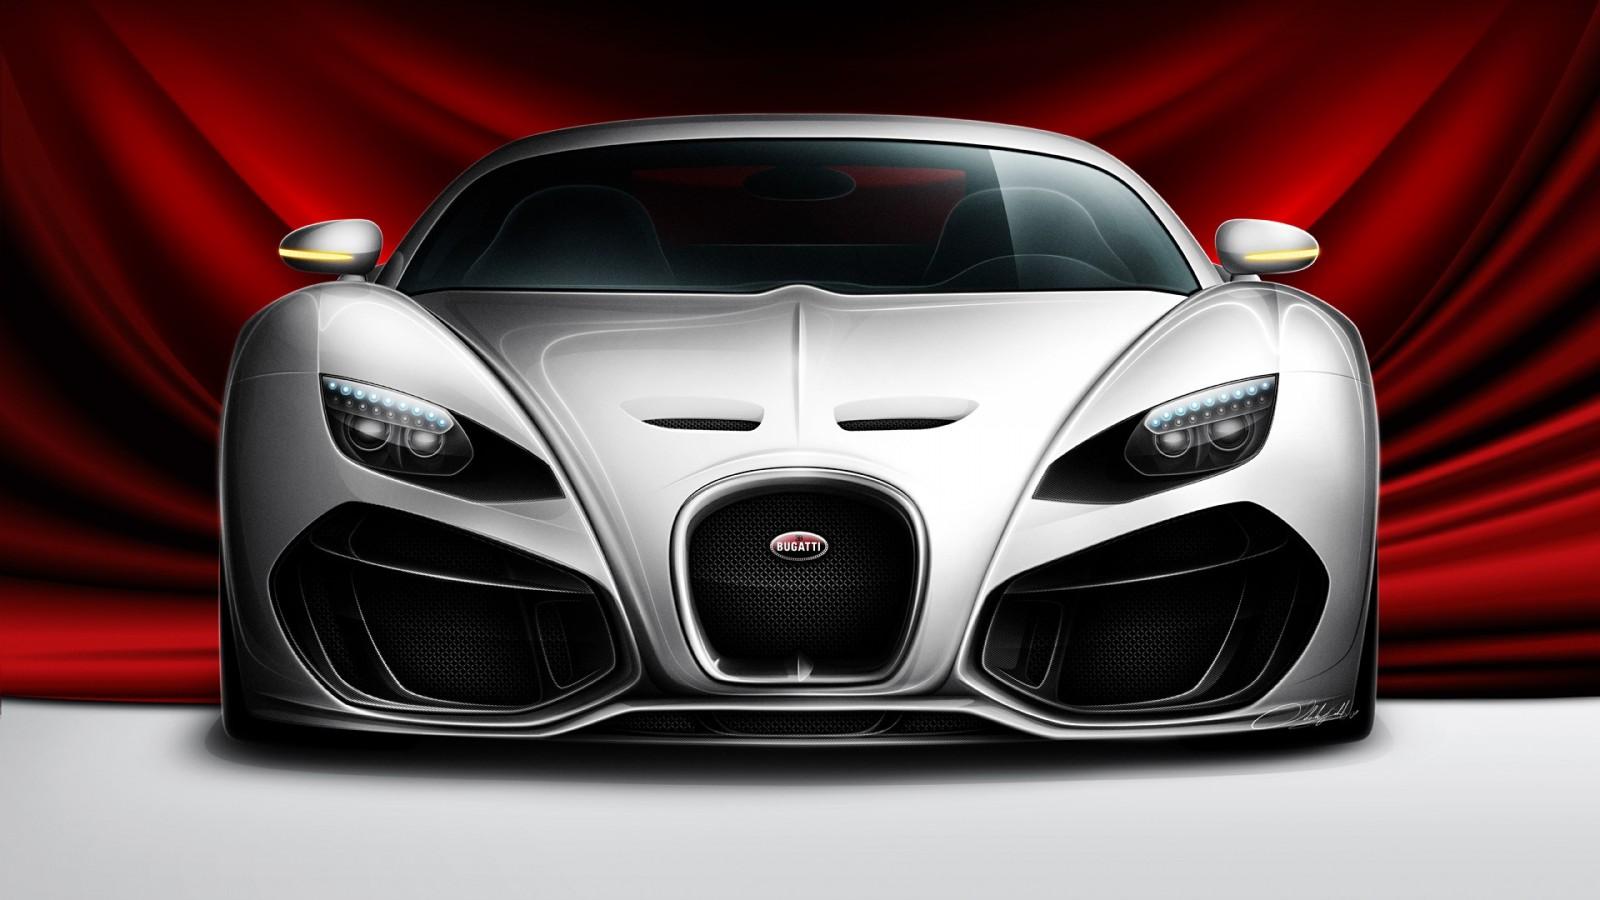 Bugatti Venom valodo design  car  sports   HD Car  HD Wallpaper